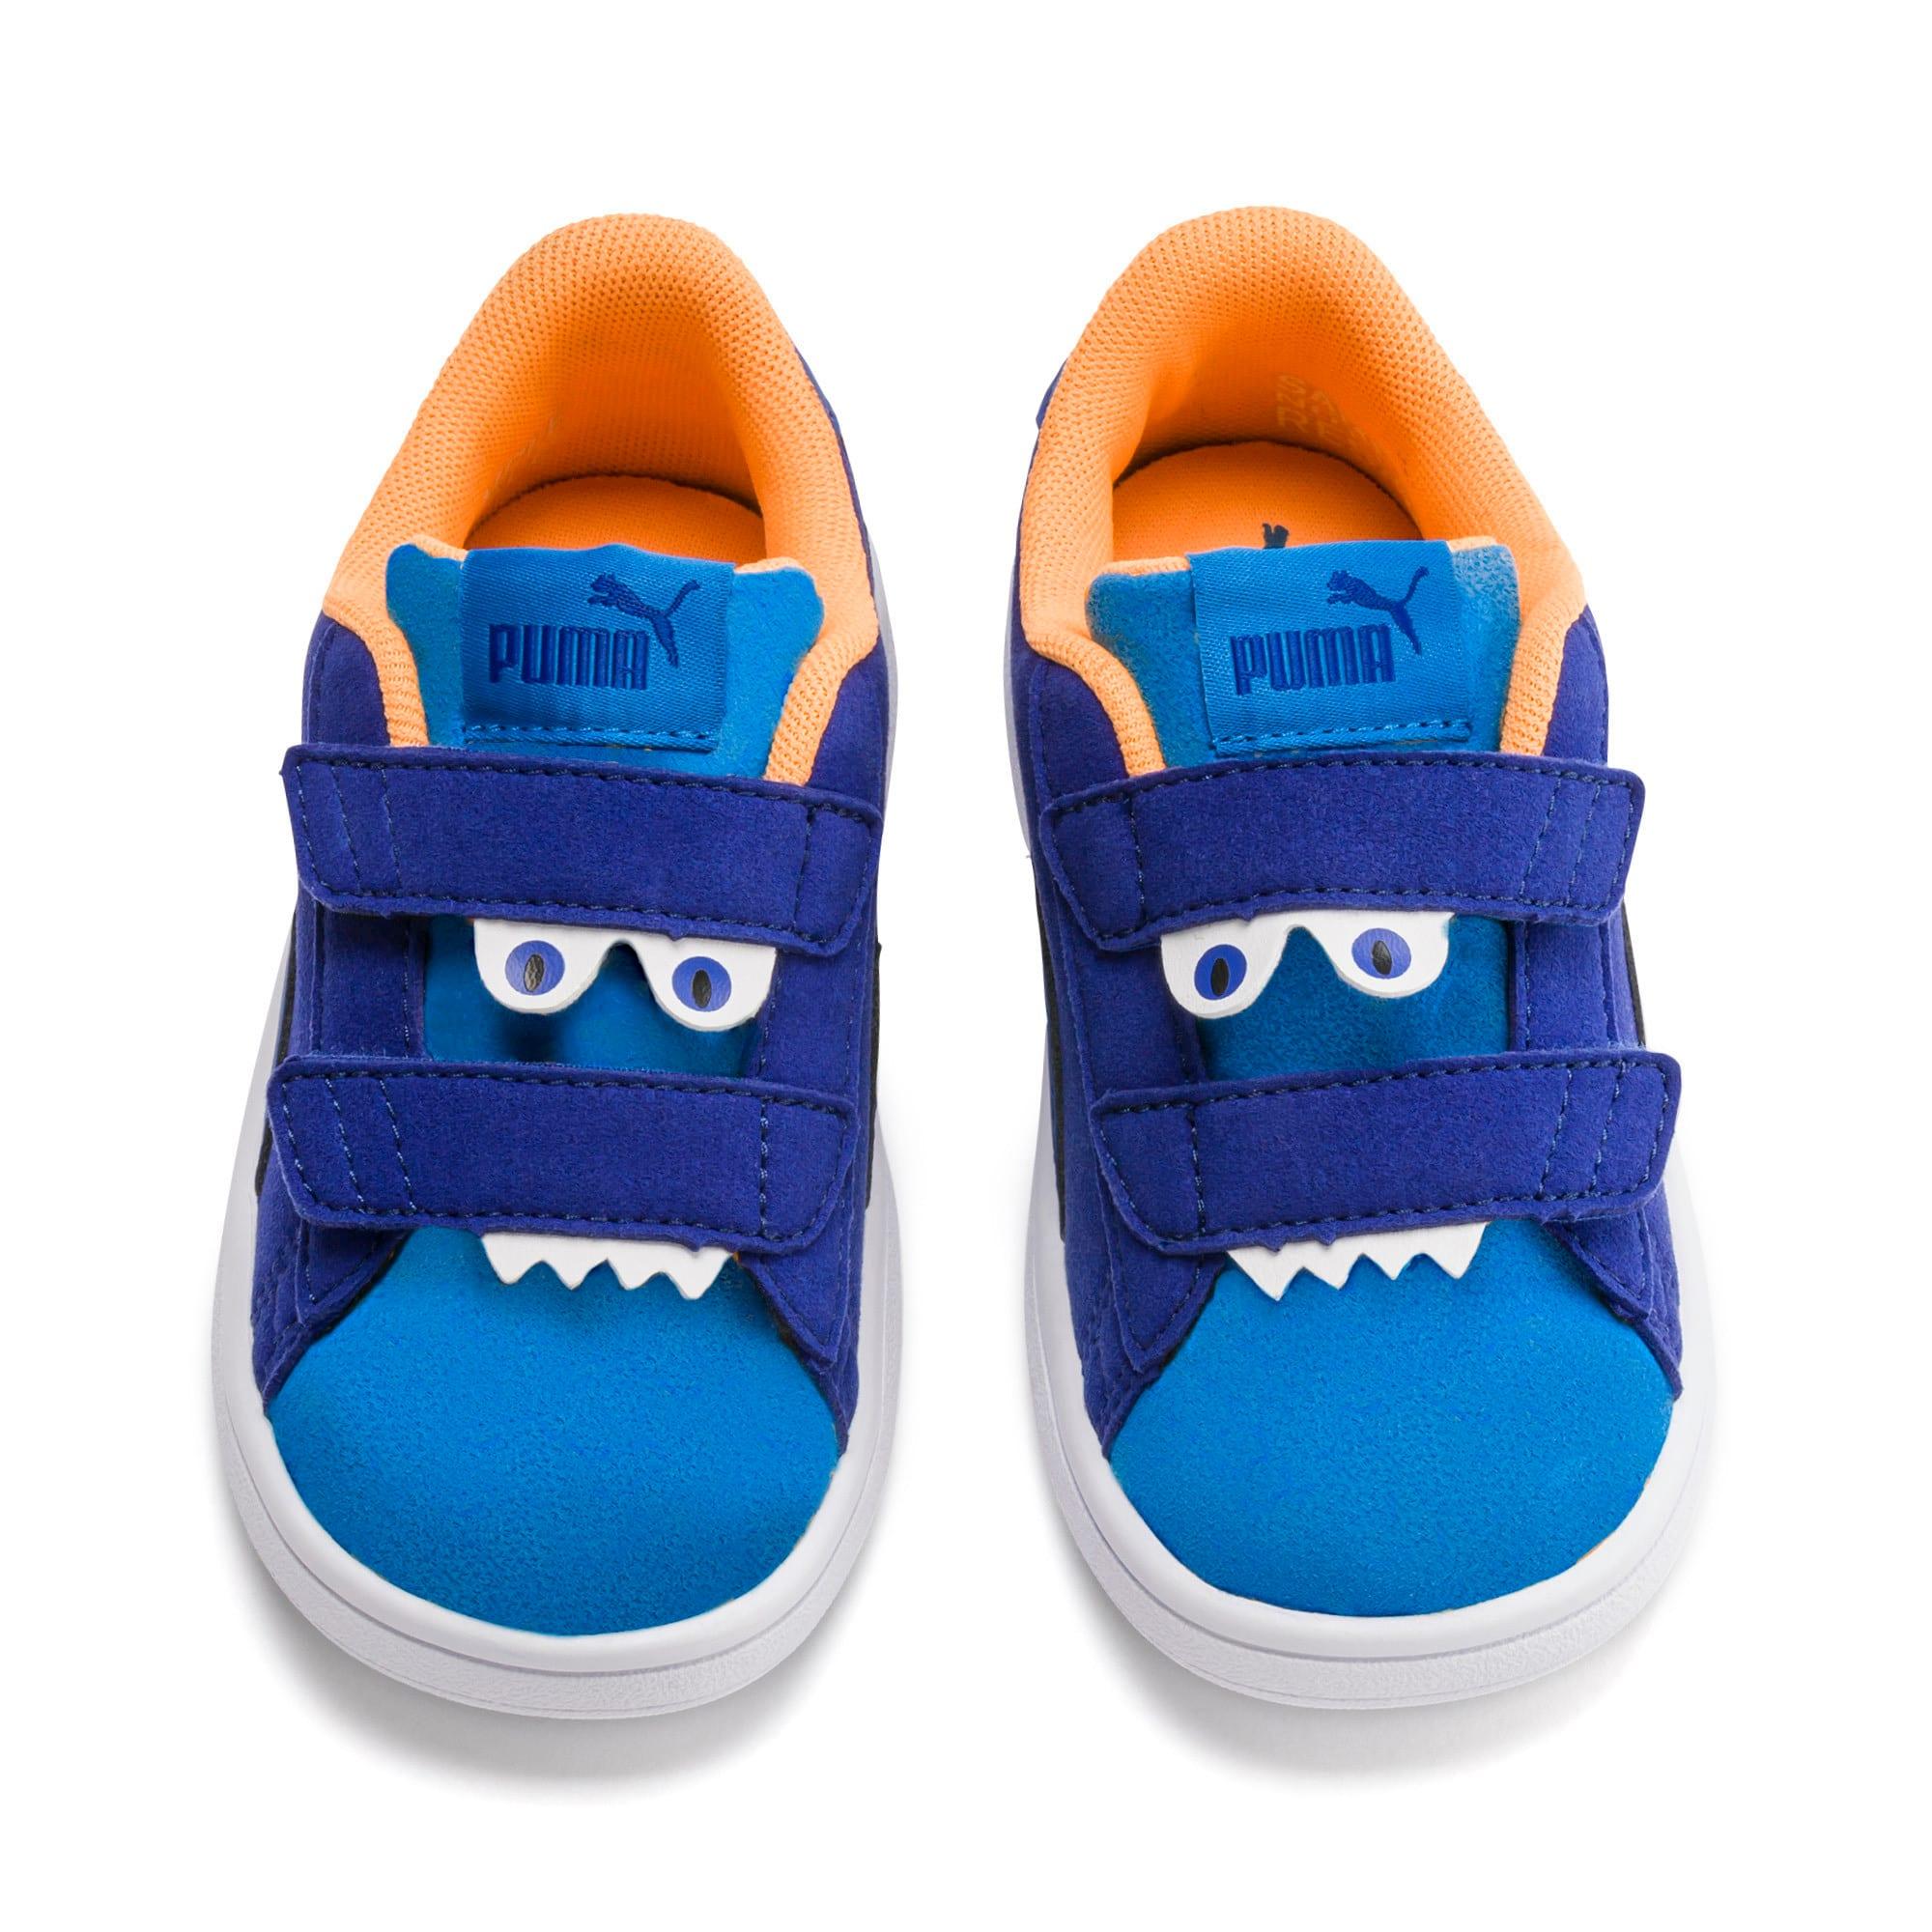 Thumbnail 7 of PUMA Smash v2 Monster Little Kids' Shoes, Sf Th Wb-I Bunting-Ornge-Wht, medium